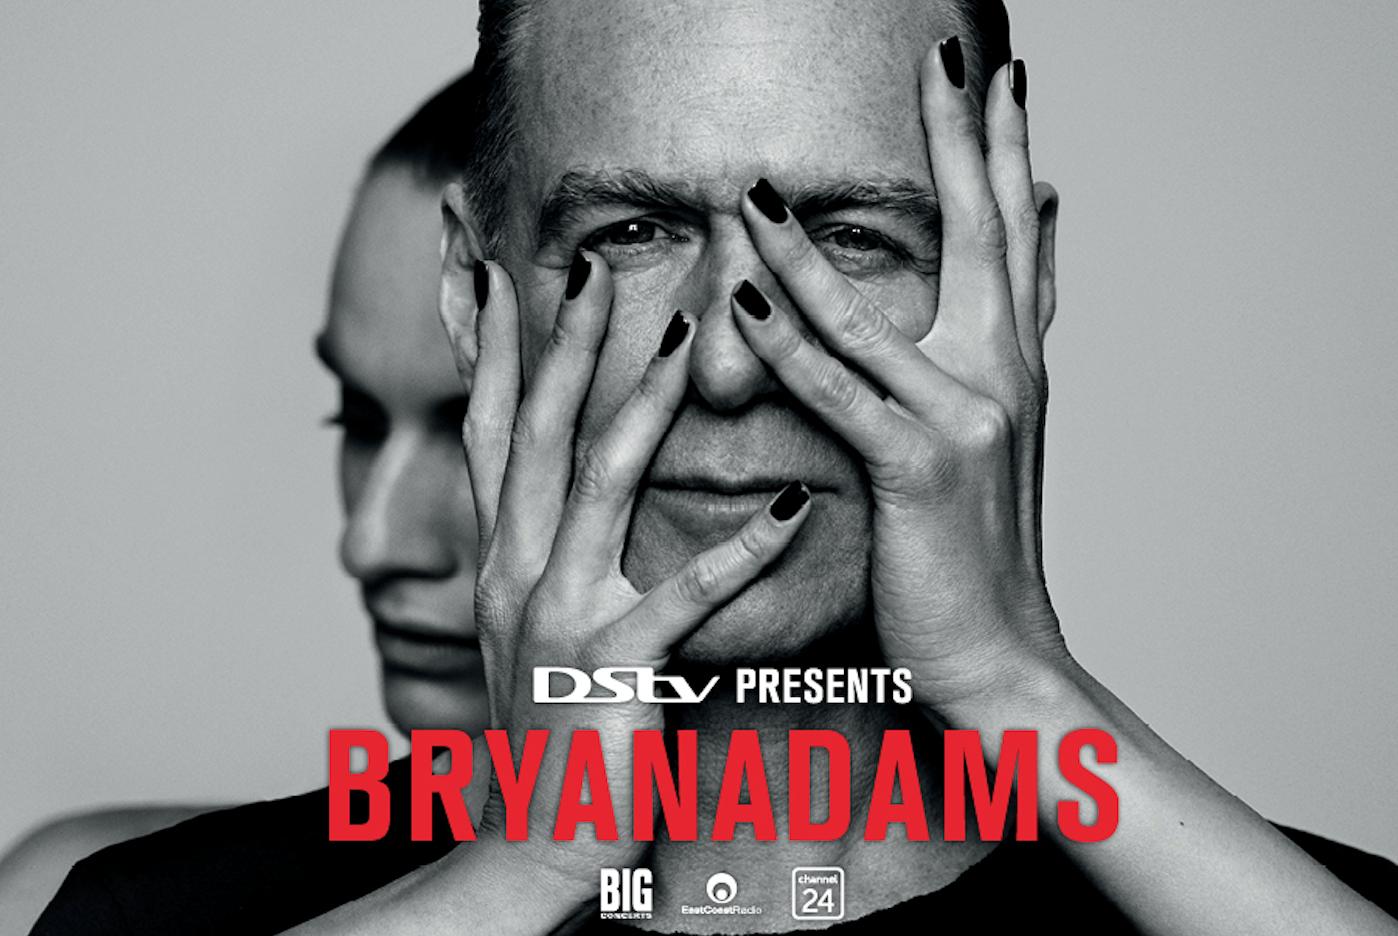 bryan adams concert